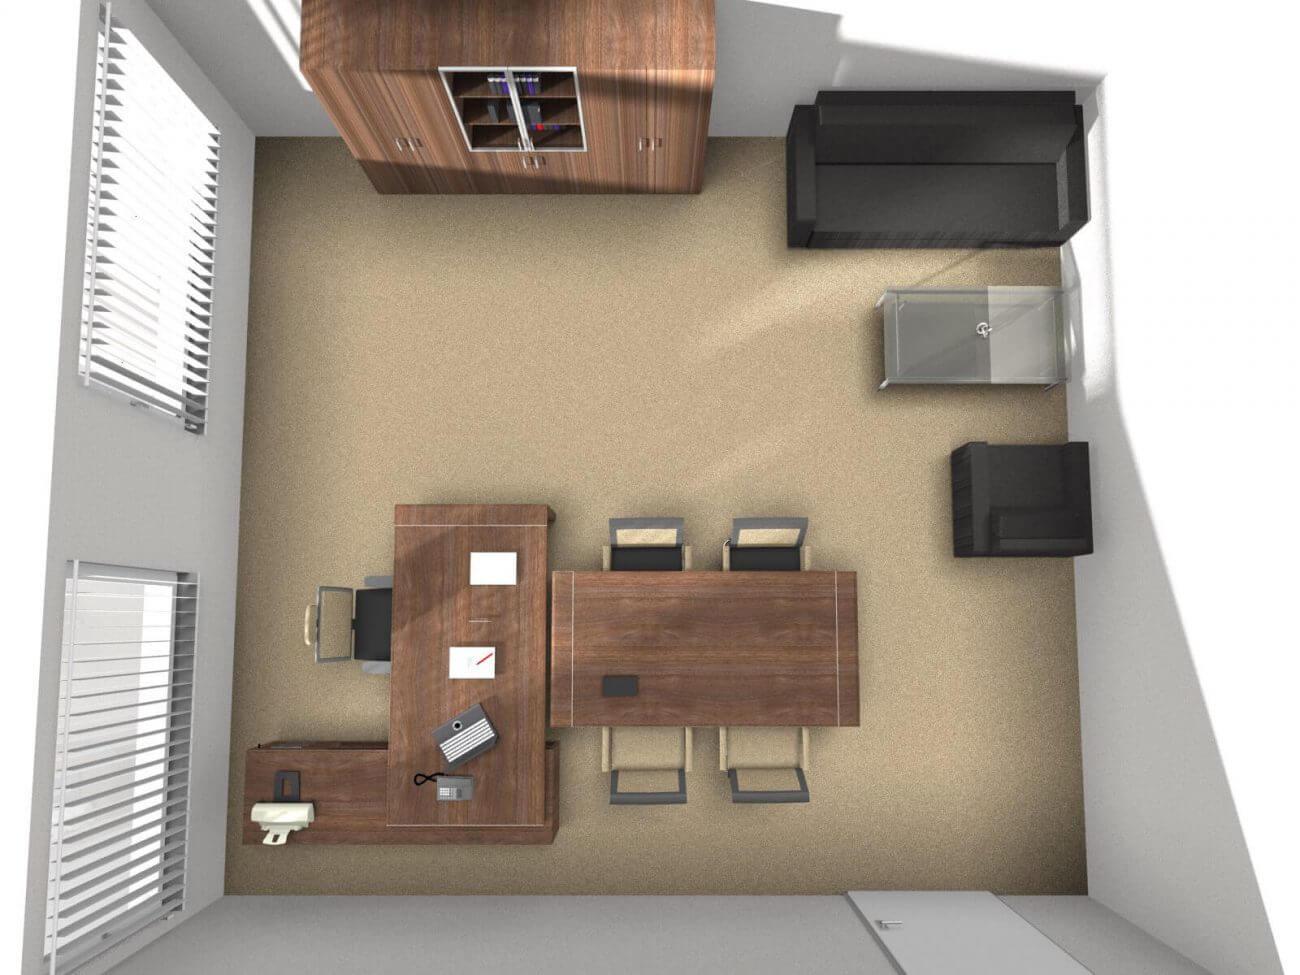 Návrh interiéru DirectorCapital pôdorys - Ekoma